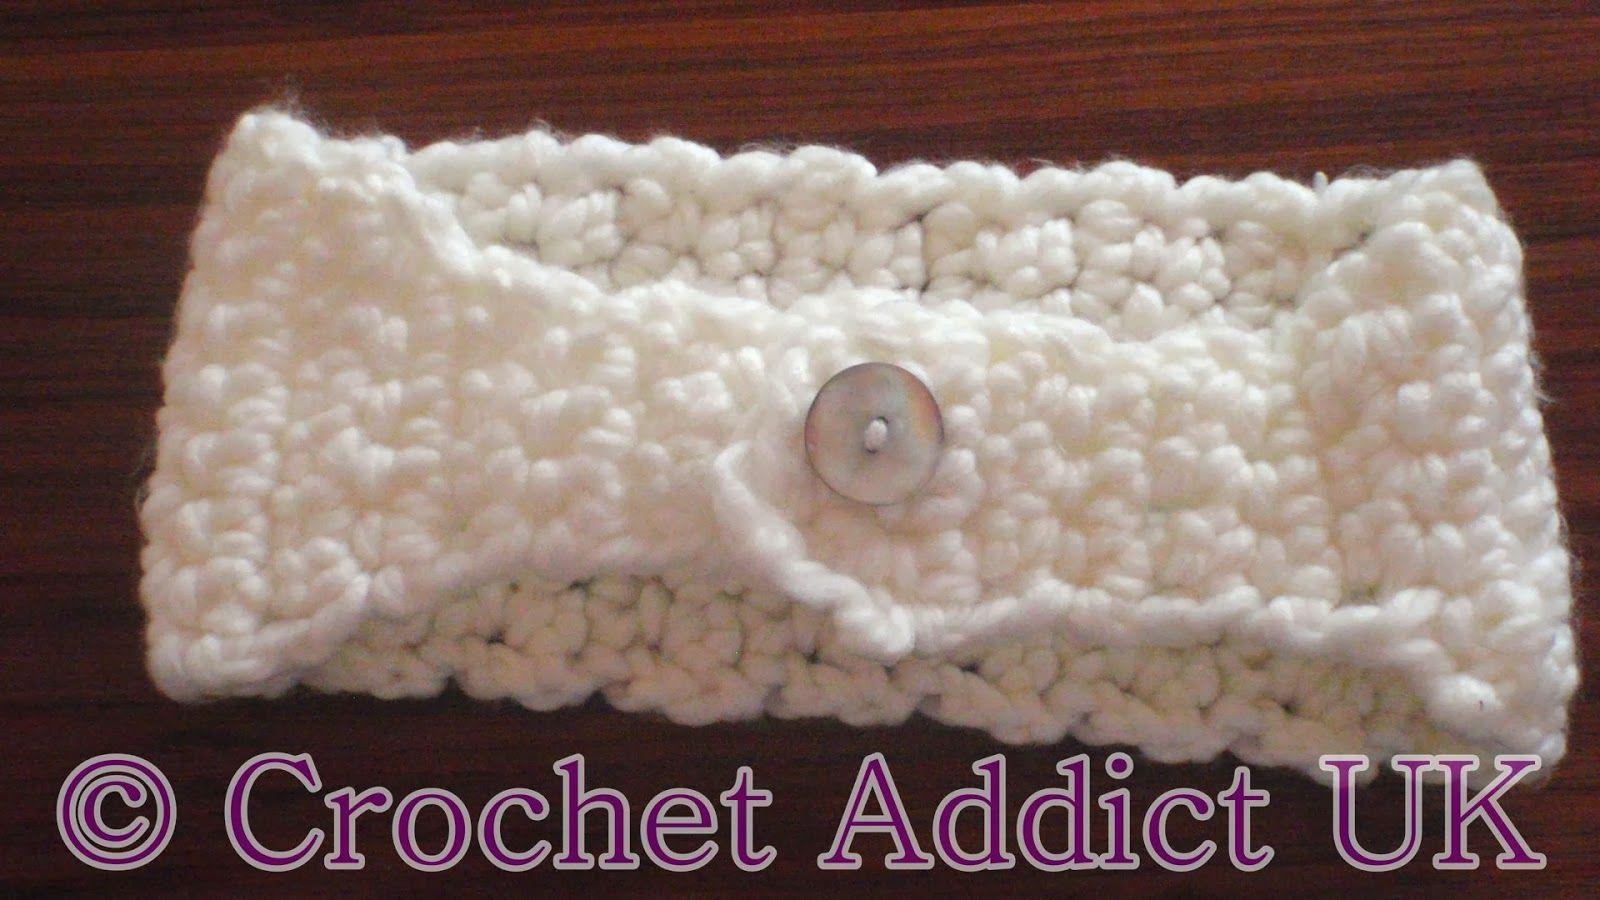 Free crochet chunky headband pattern crochet addict uk misc free crochet chunky headband pattern crochet addict uk bankloansurffo Image collections